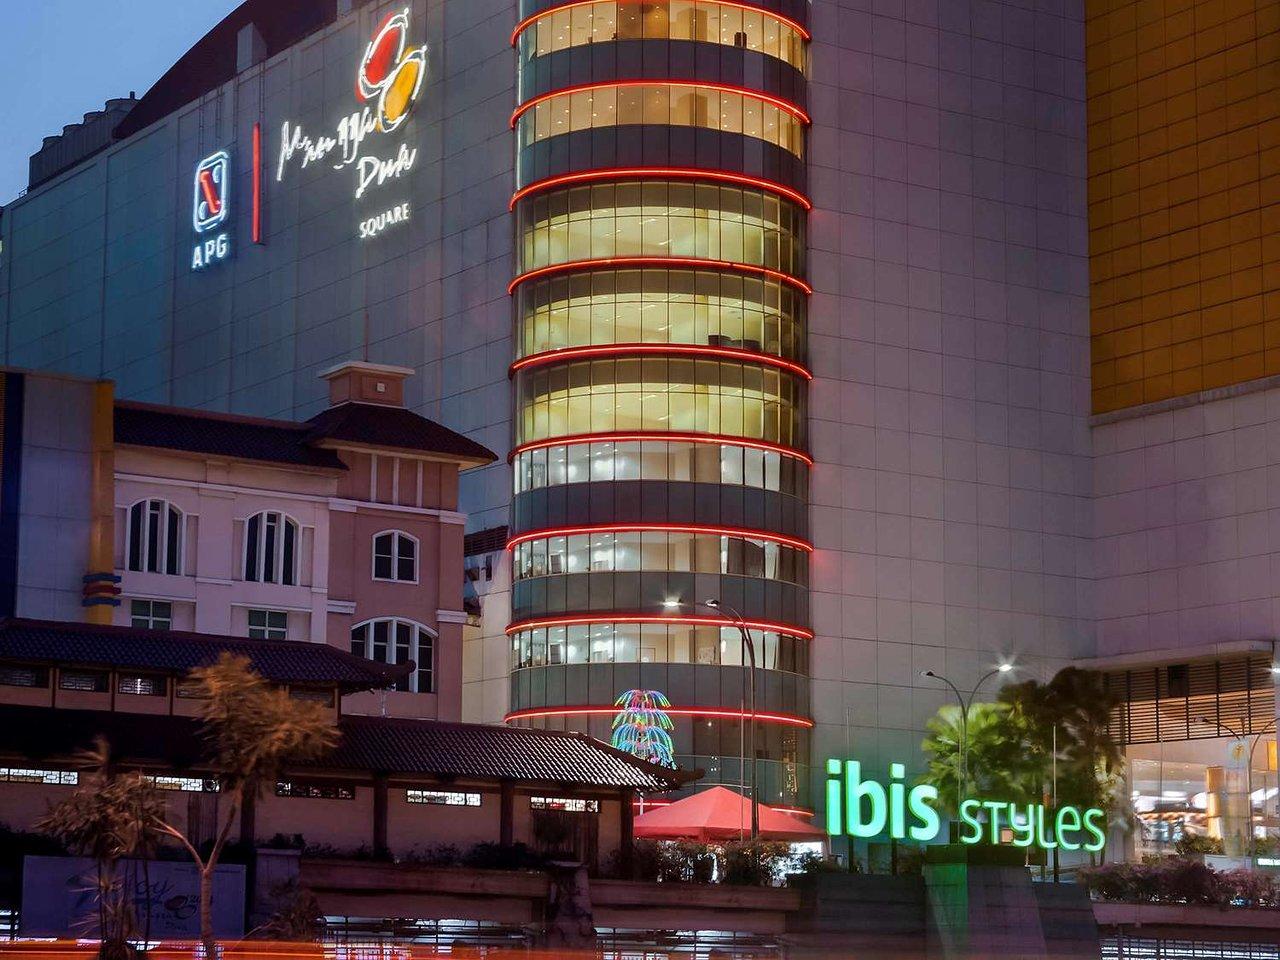 ibis styles jakarta mangga dua square hotel updated 2019 prices rh tripadvisor com